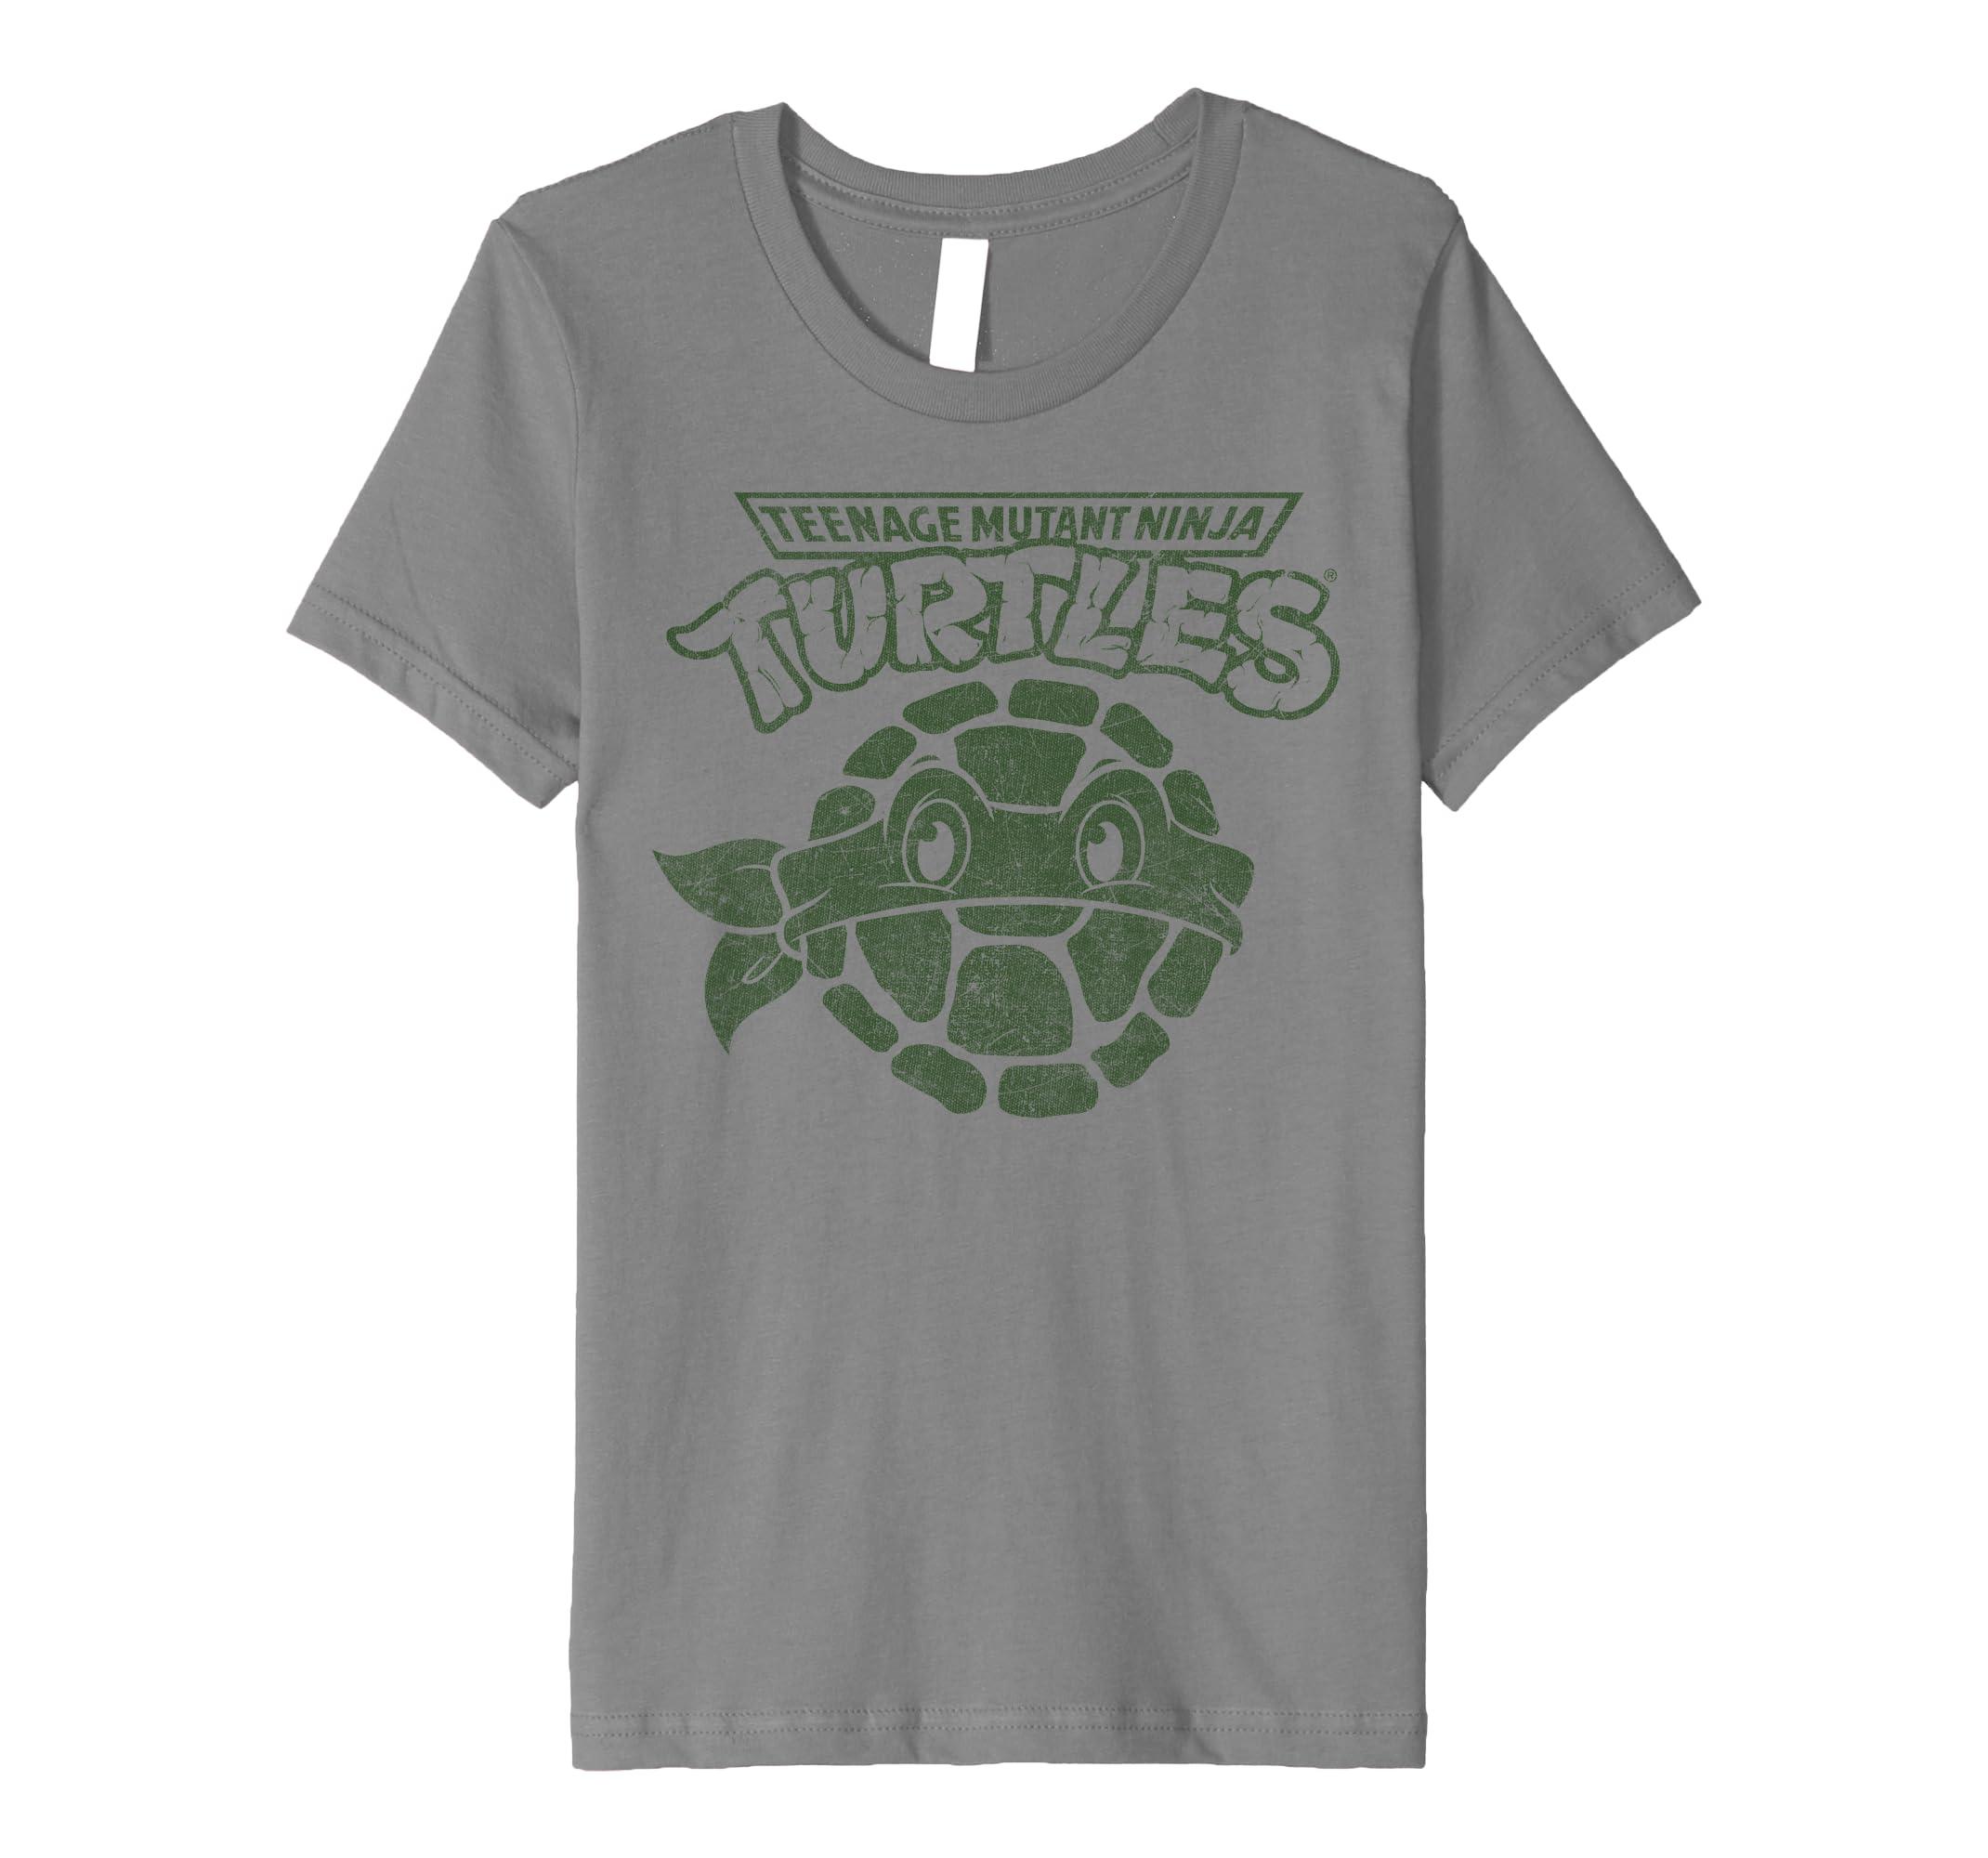 Amazon.com: Teenage Mutant Ninja Turtles Green Turtle Shell ...